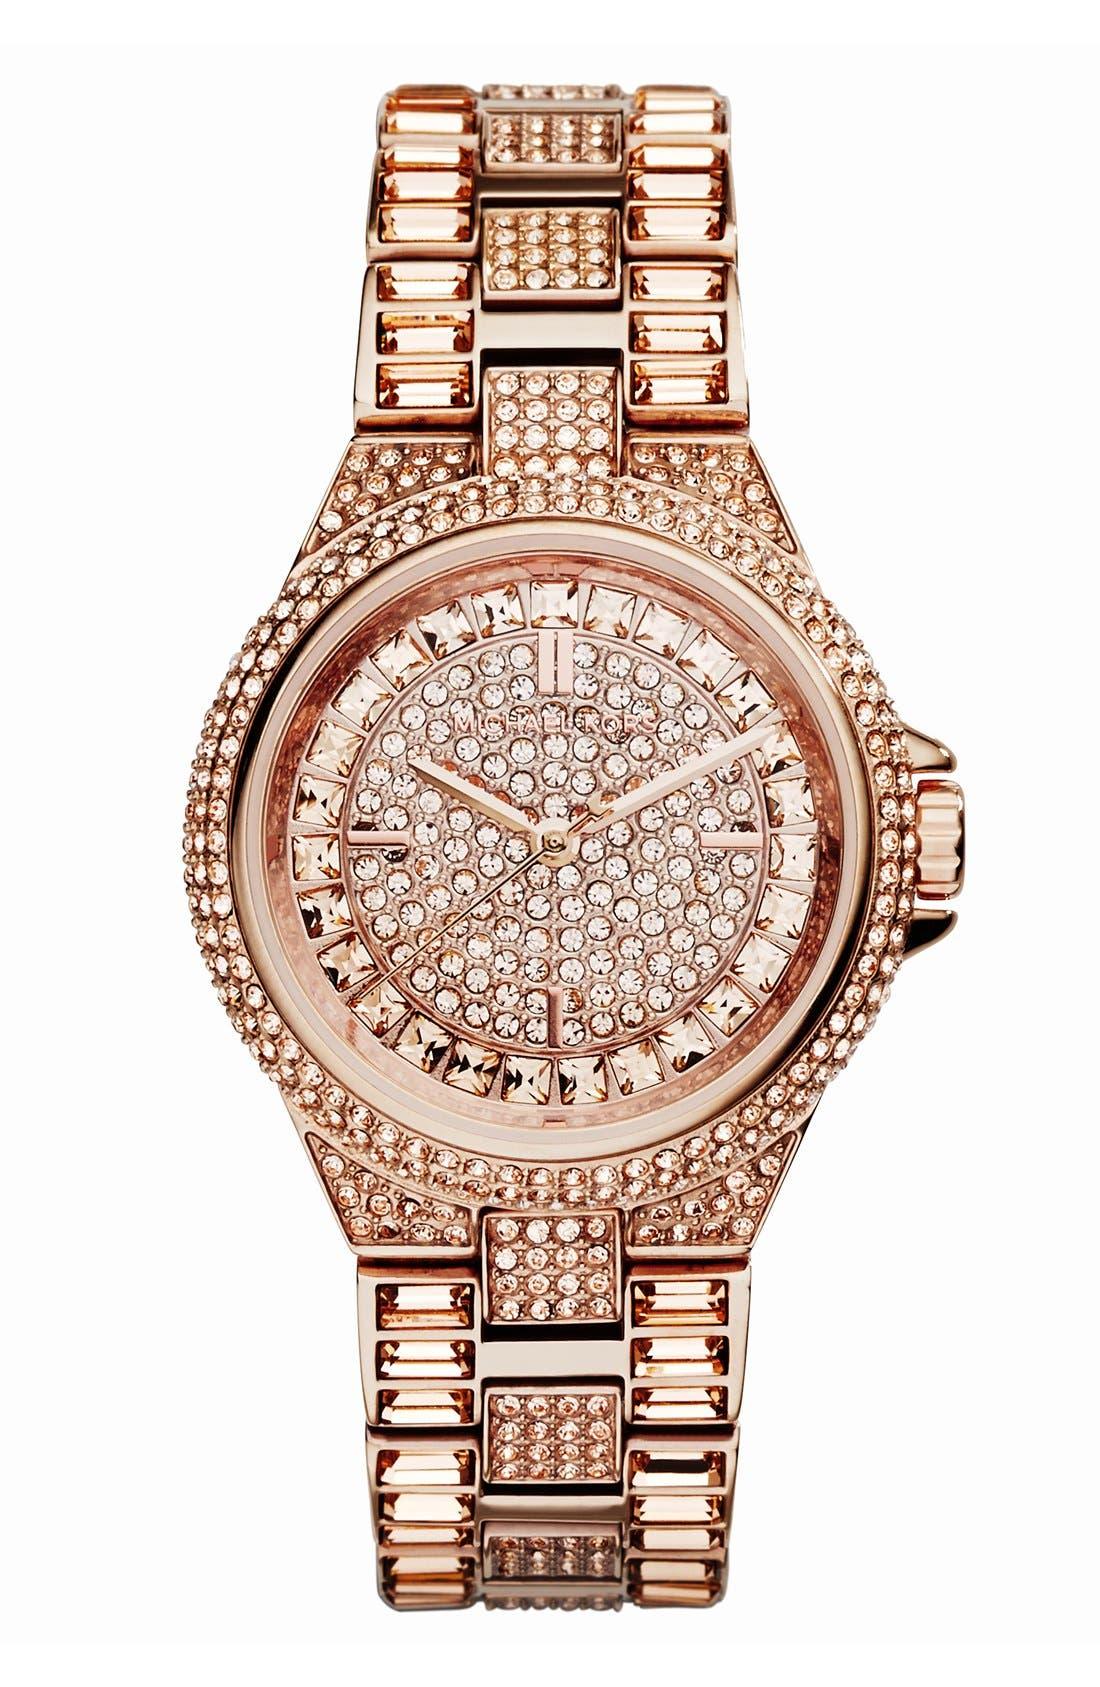 Main Image - Michael Kors 'Mini Camille' Crystal Encrusted Bracelet Watch, 33mm